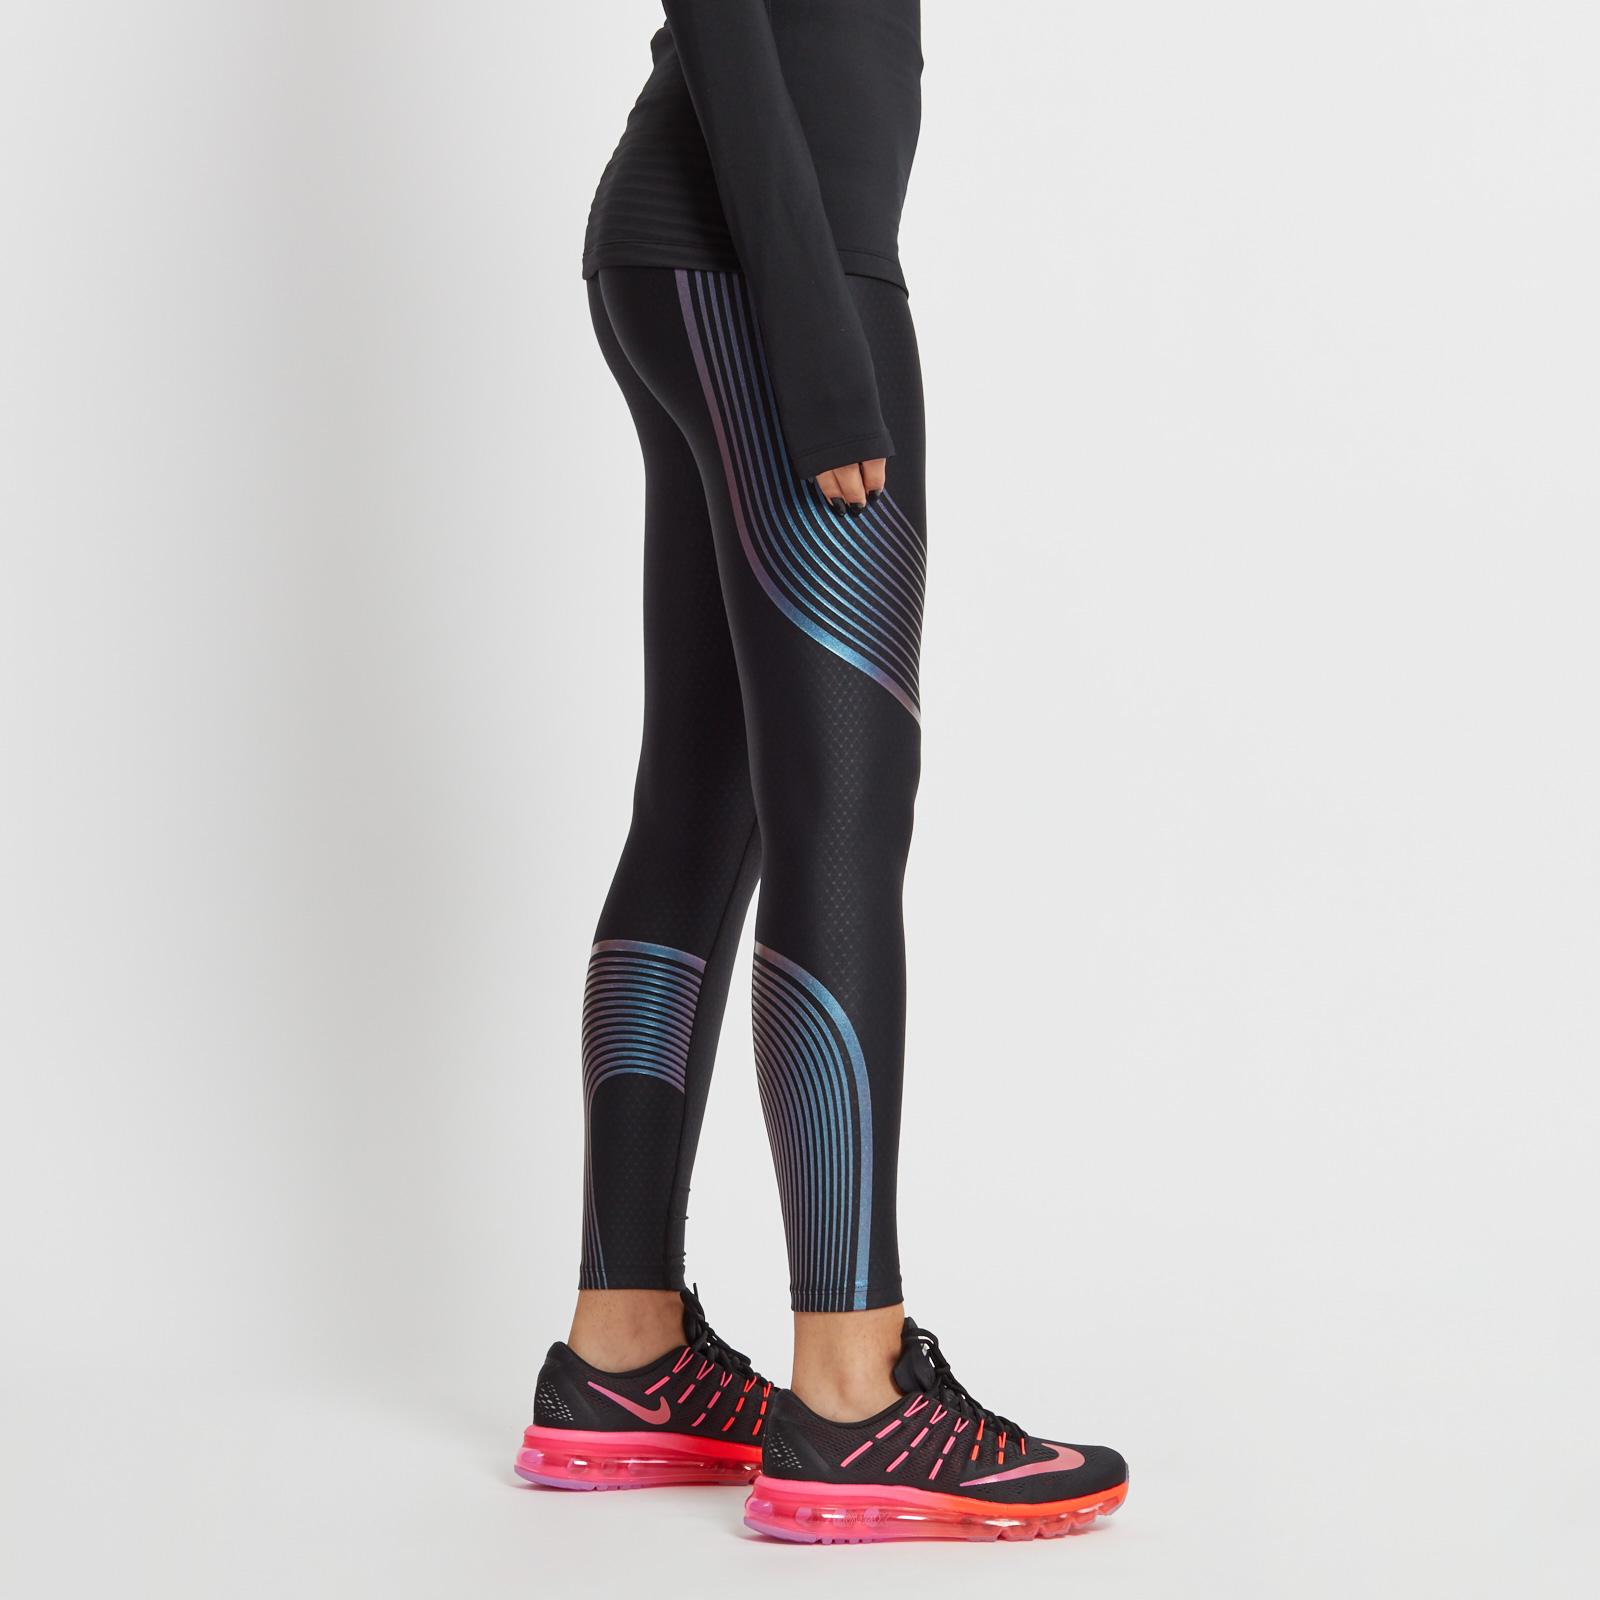 Nike Power Speed Running Tight Nike Power Speed Running Tight ... 33243641b